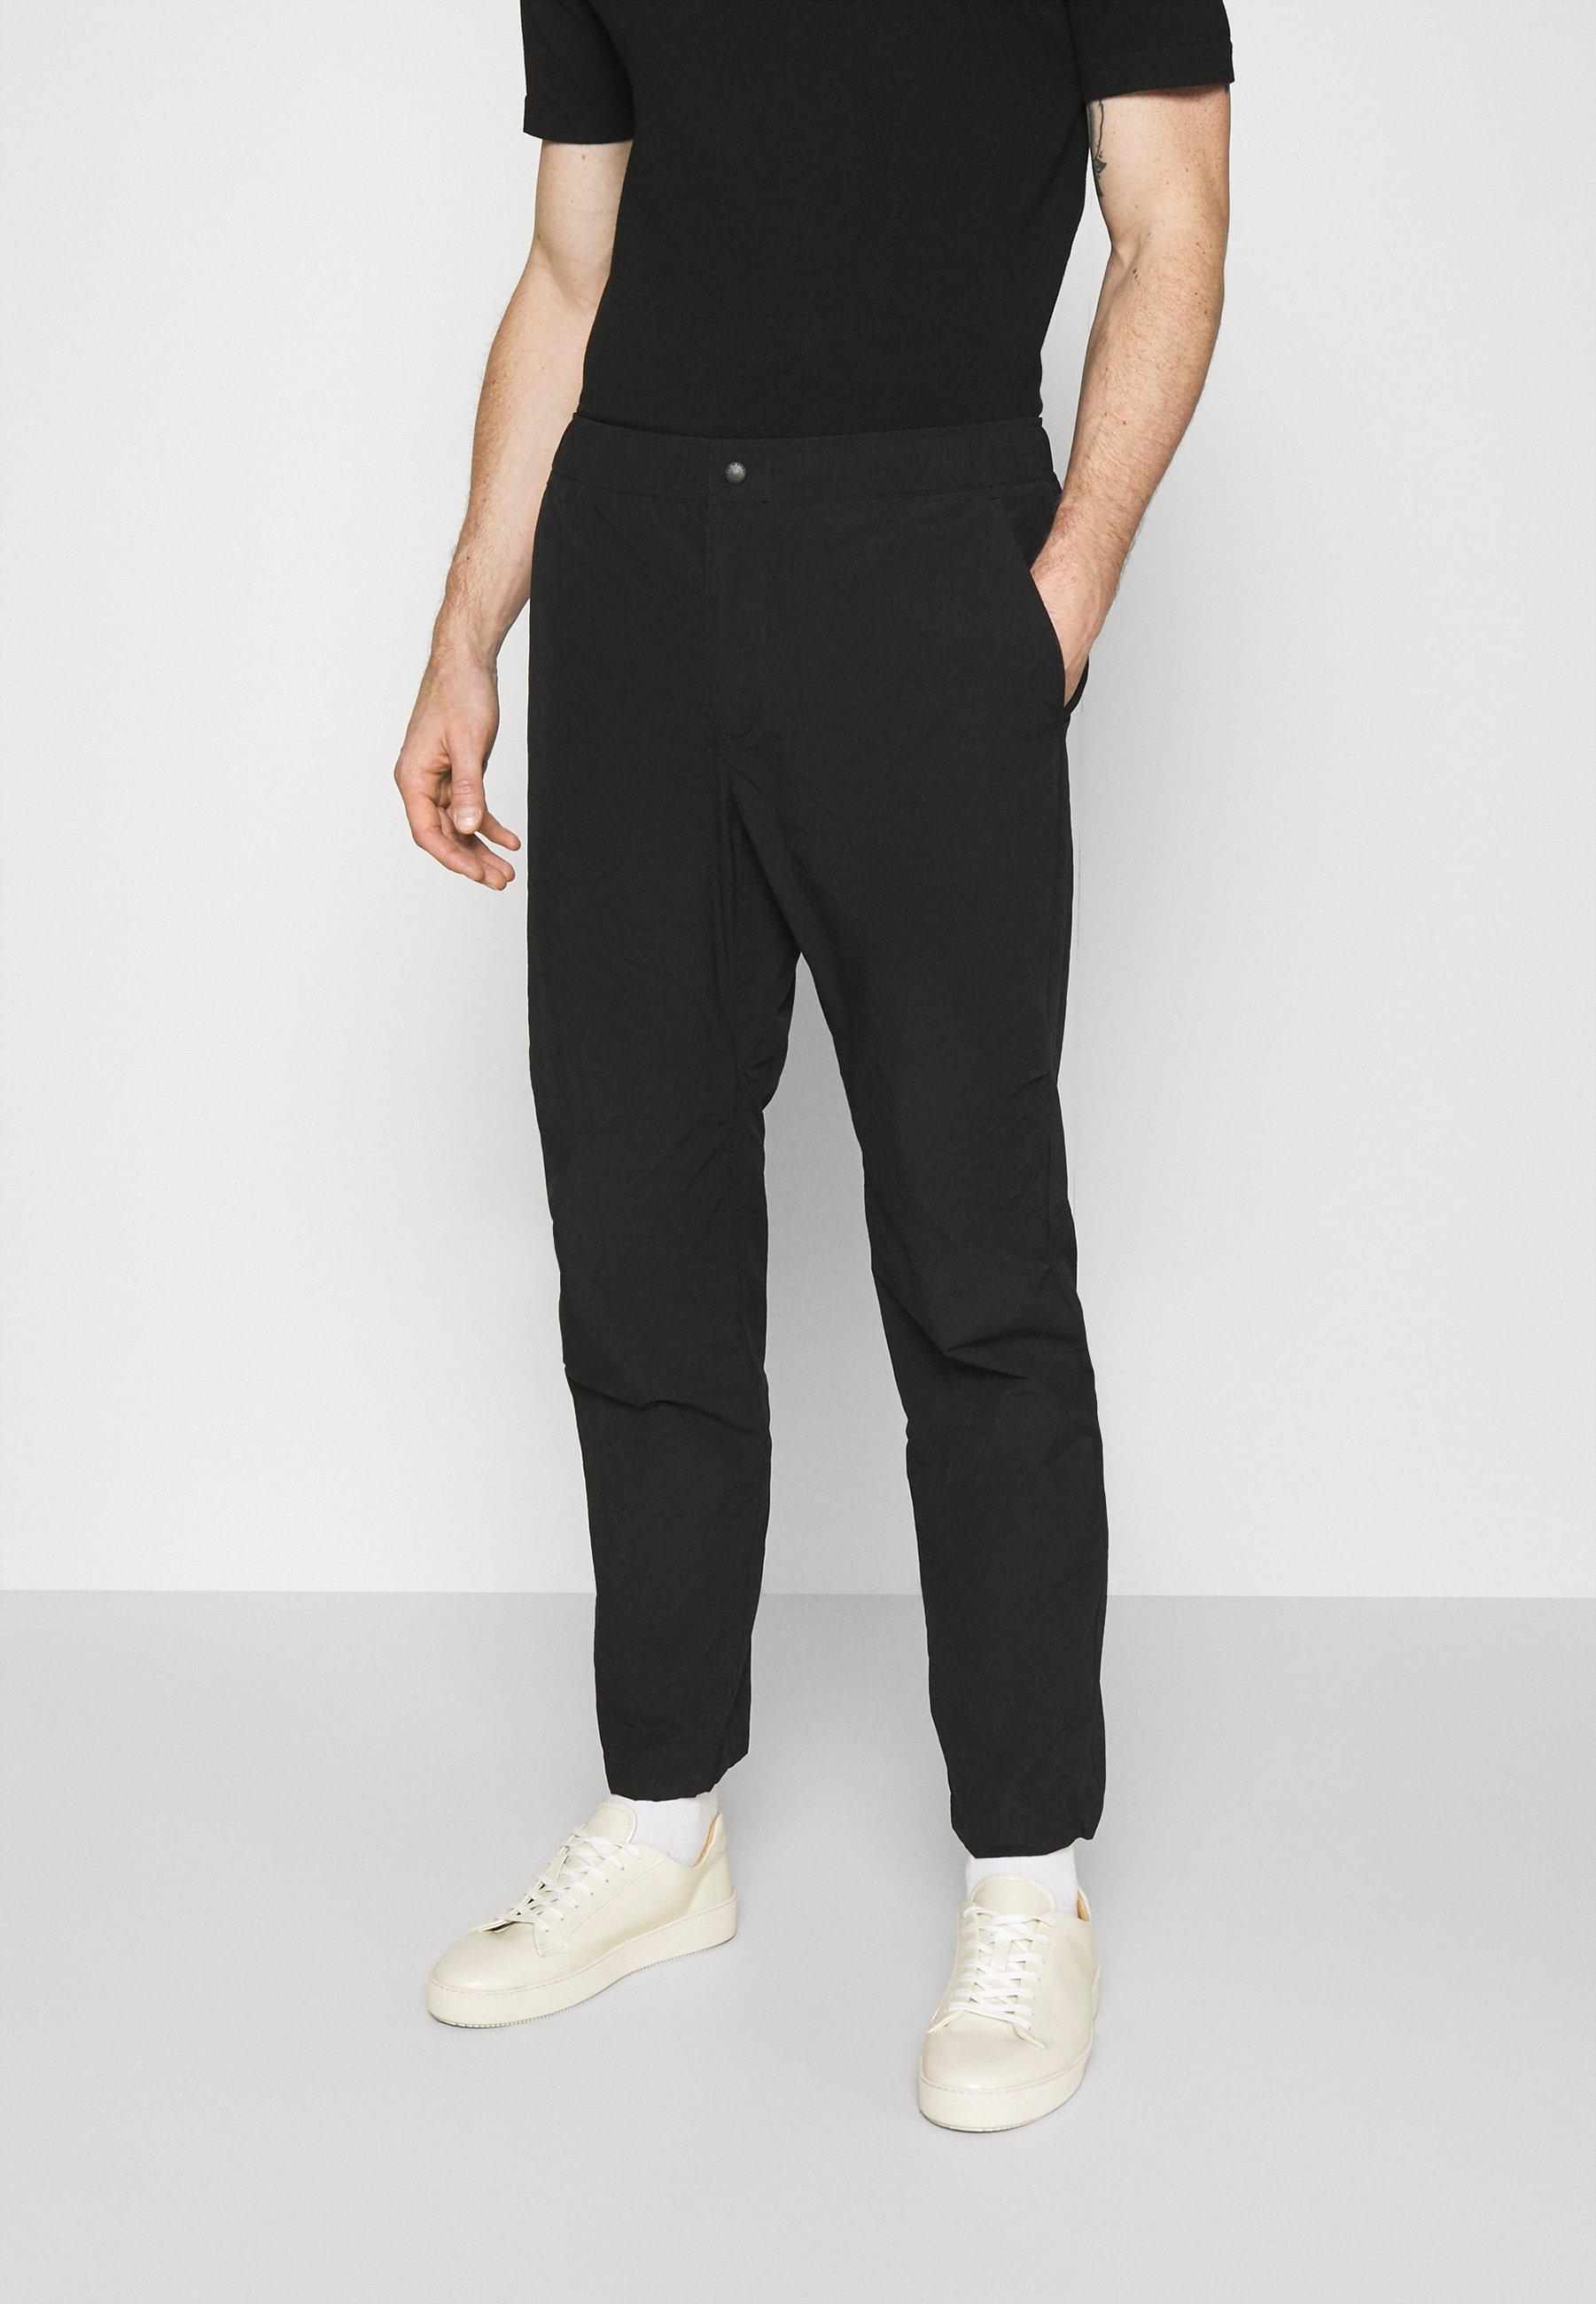 Uomo FLYNT PANT IN TECH - Pantaloni